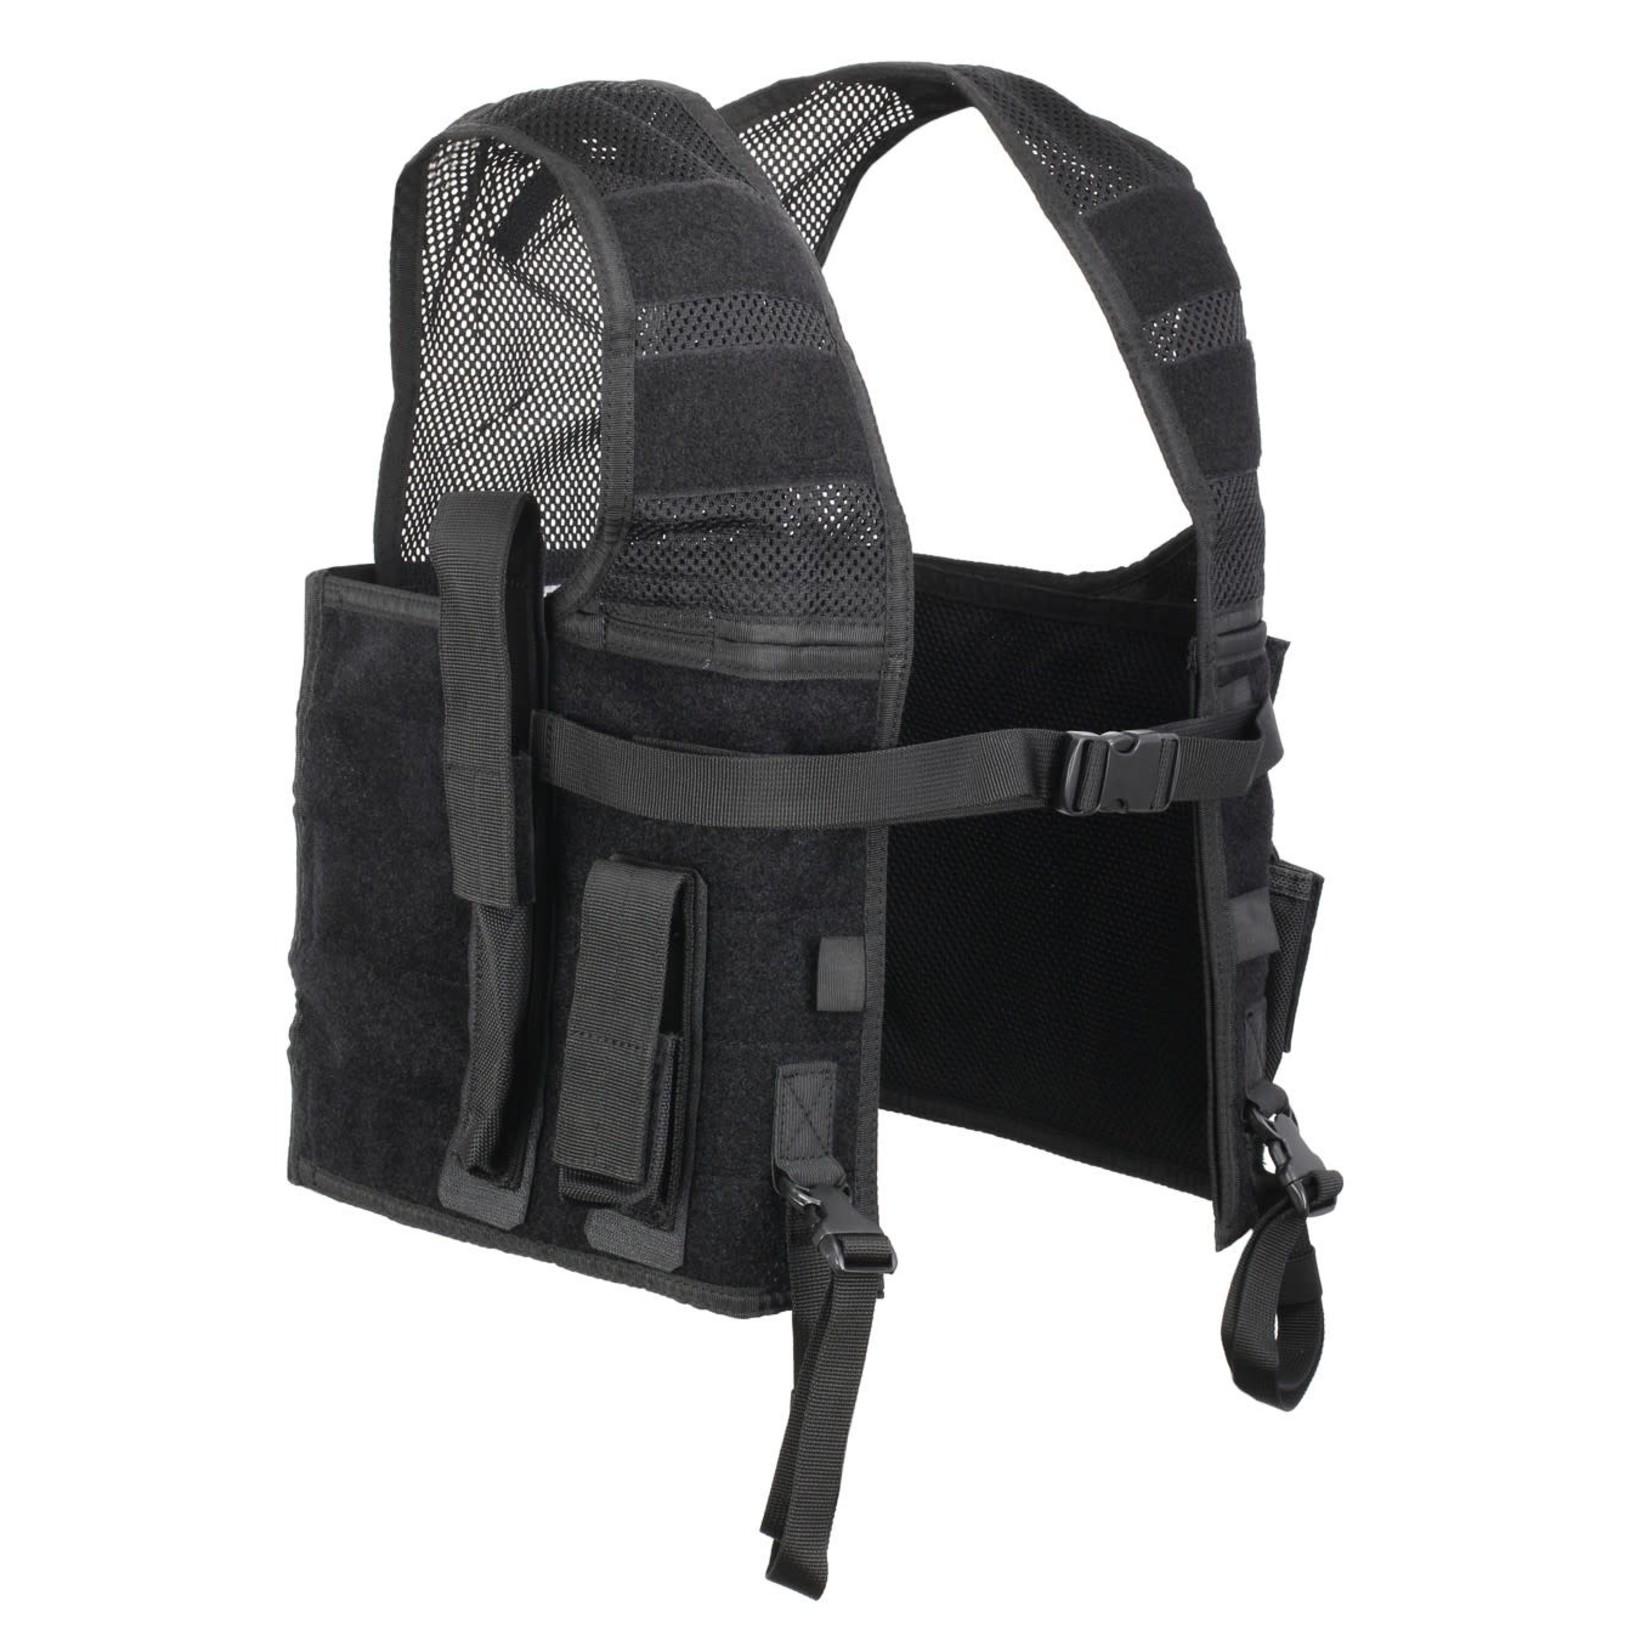 5.11 Tactical 5.11 Mesh Concealment Vest